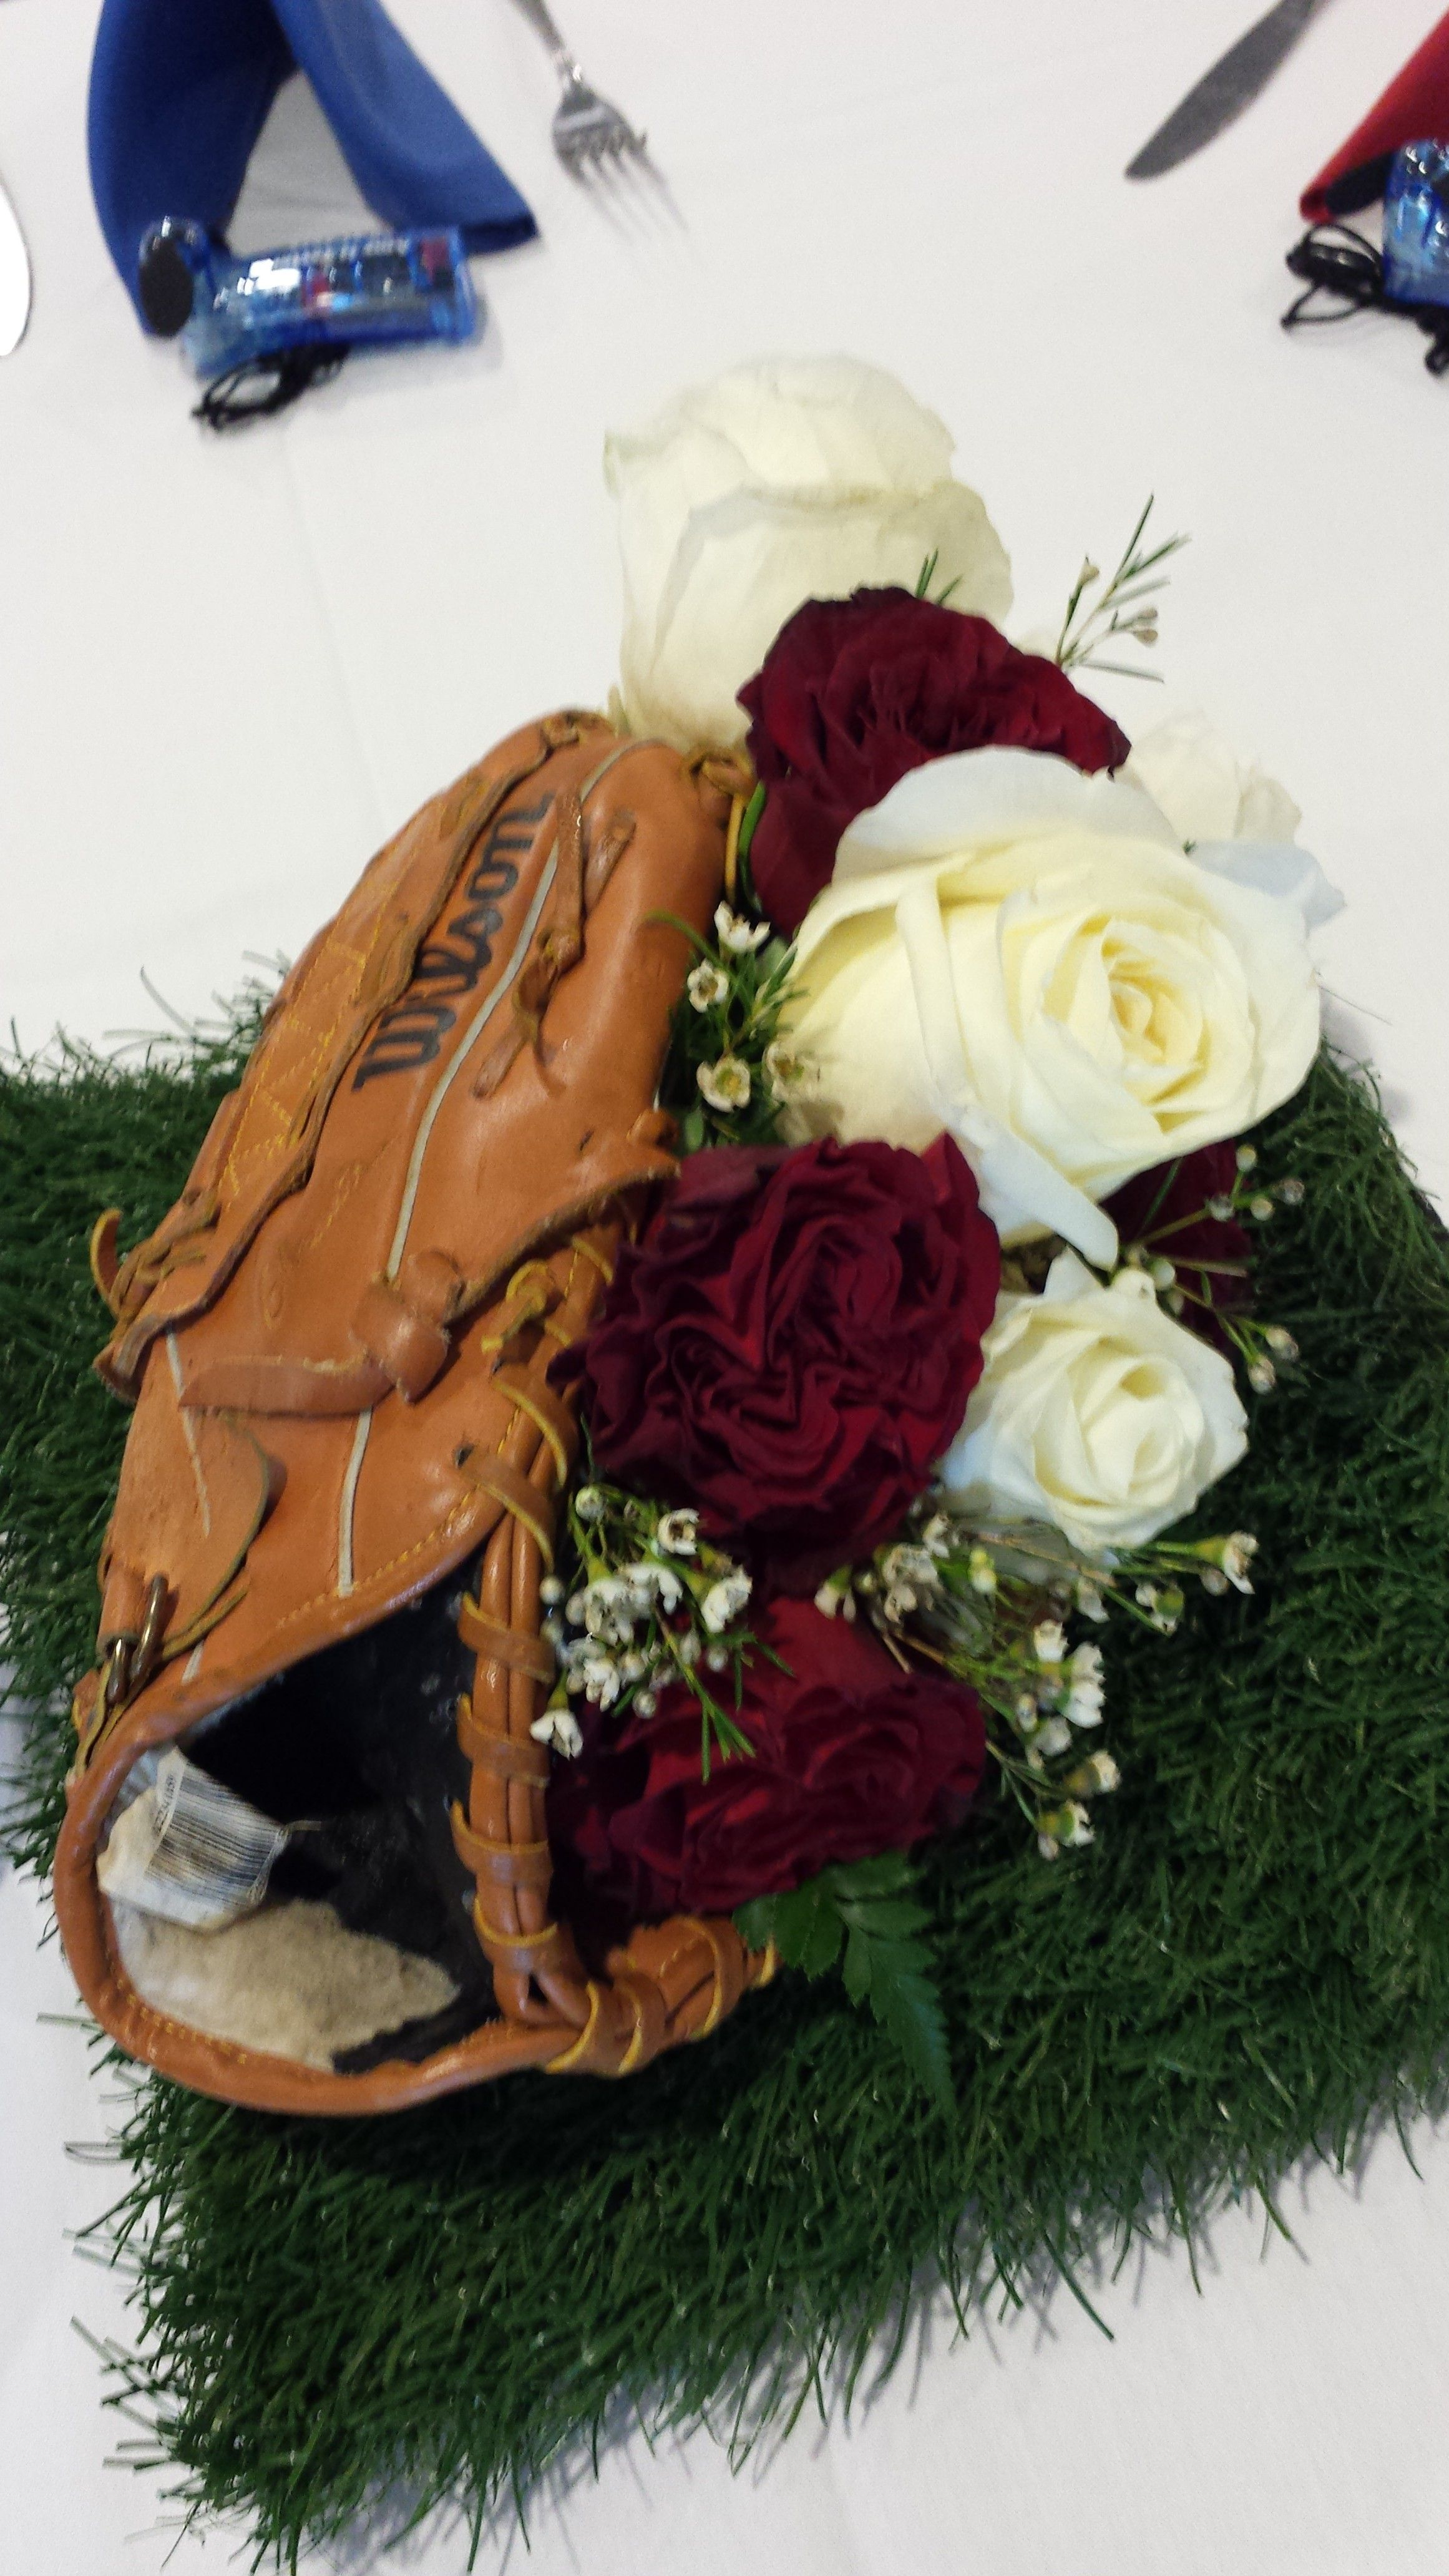 Baseball themed weddings flowers baseball mitt holding red hearts baseball themed weddings flowers baseball mitt holding red hearts roses white chocolate roses and junglespirit Images